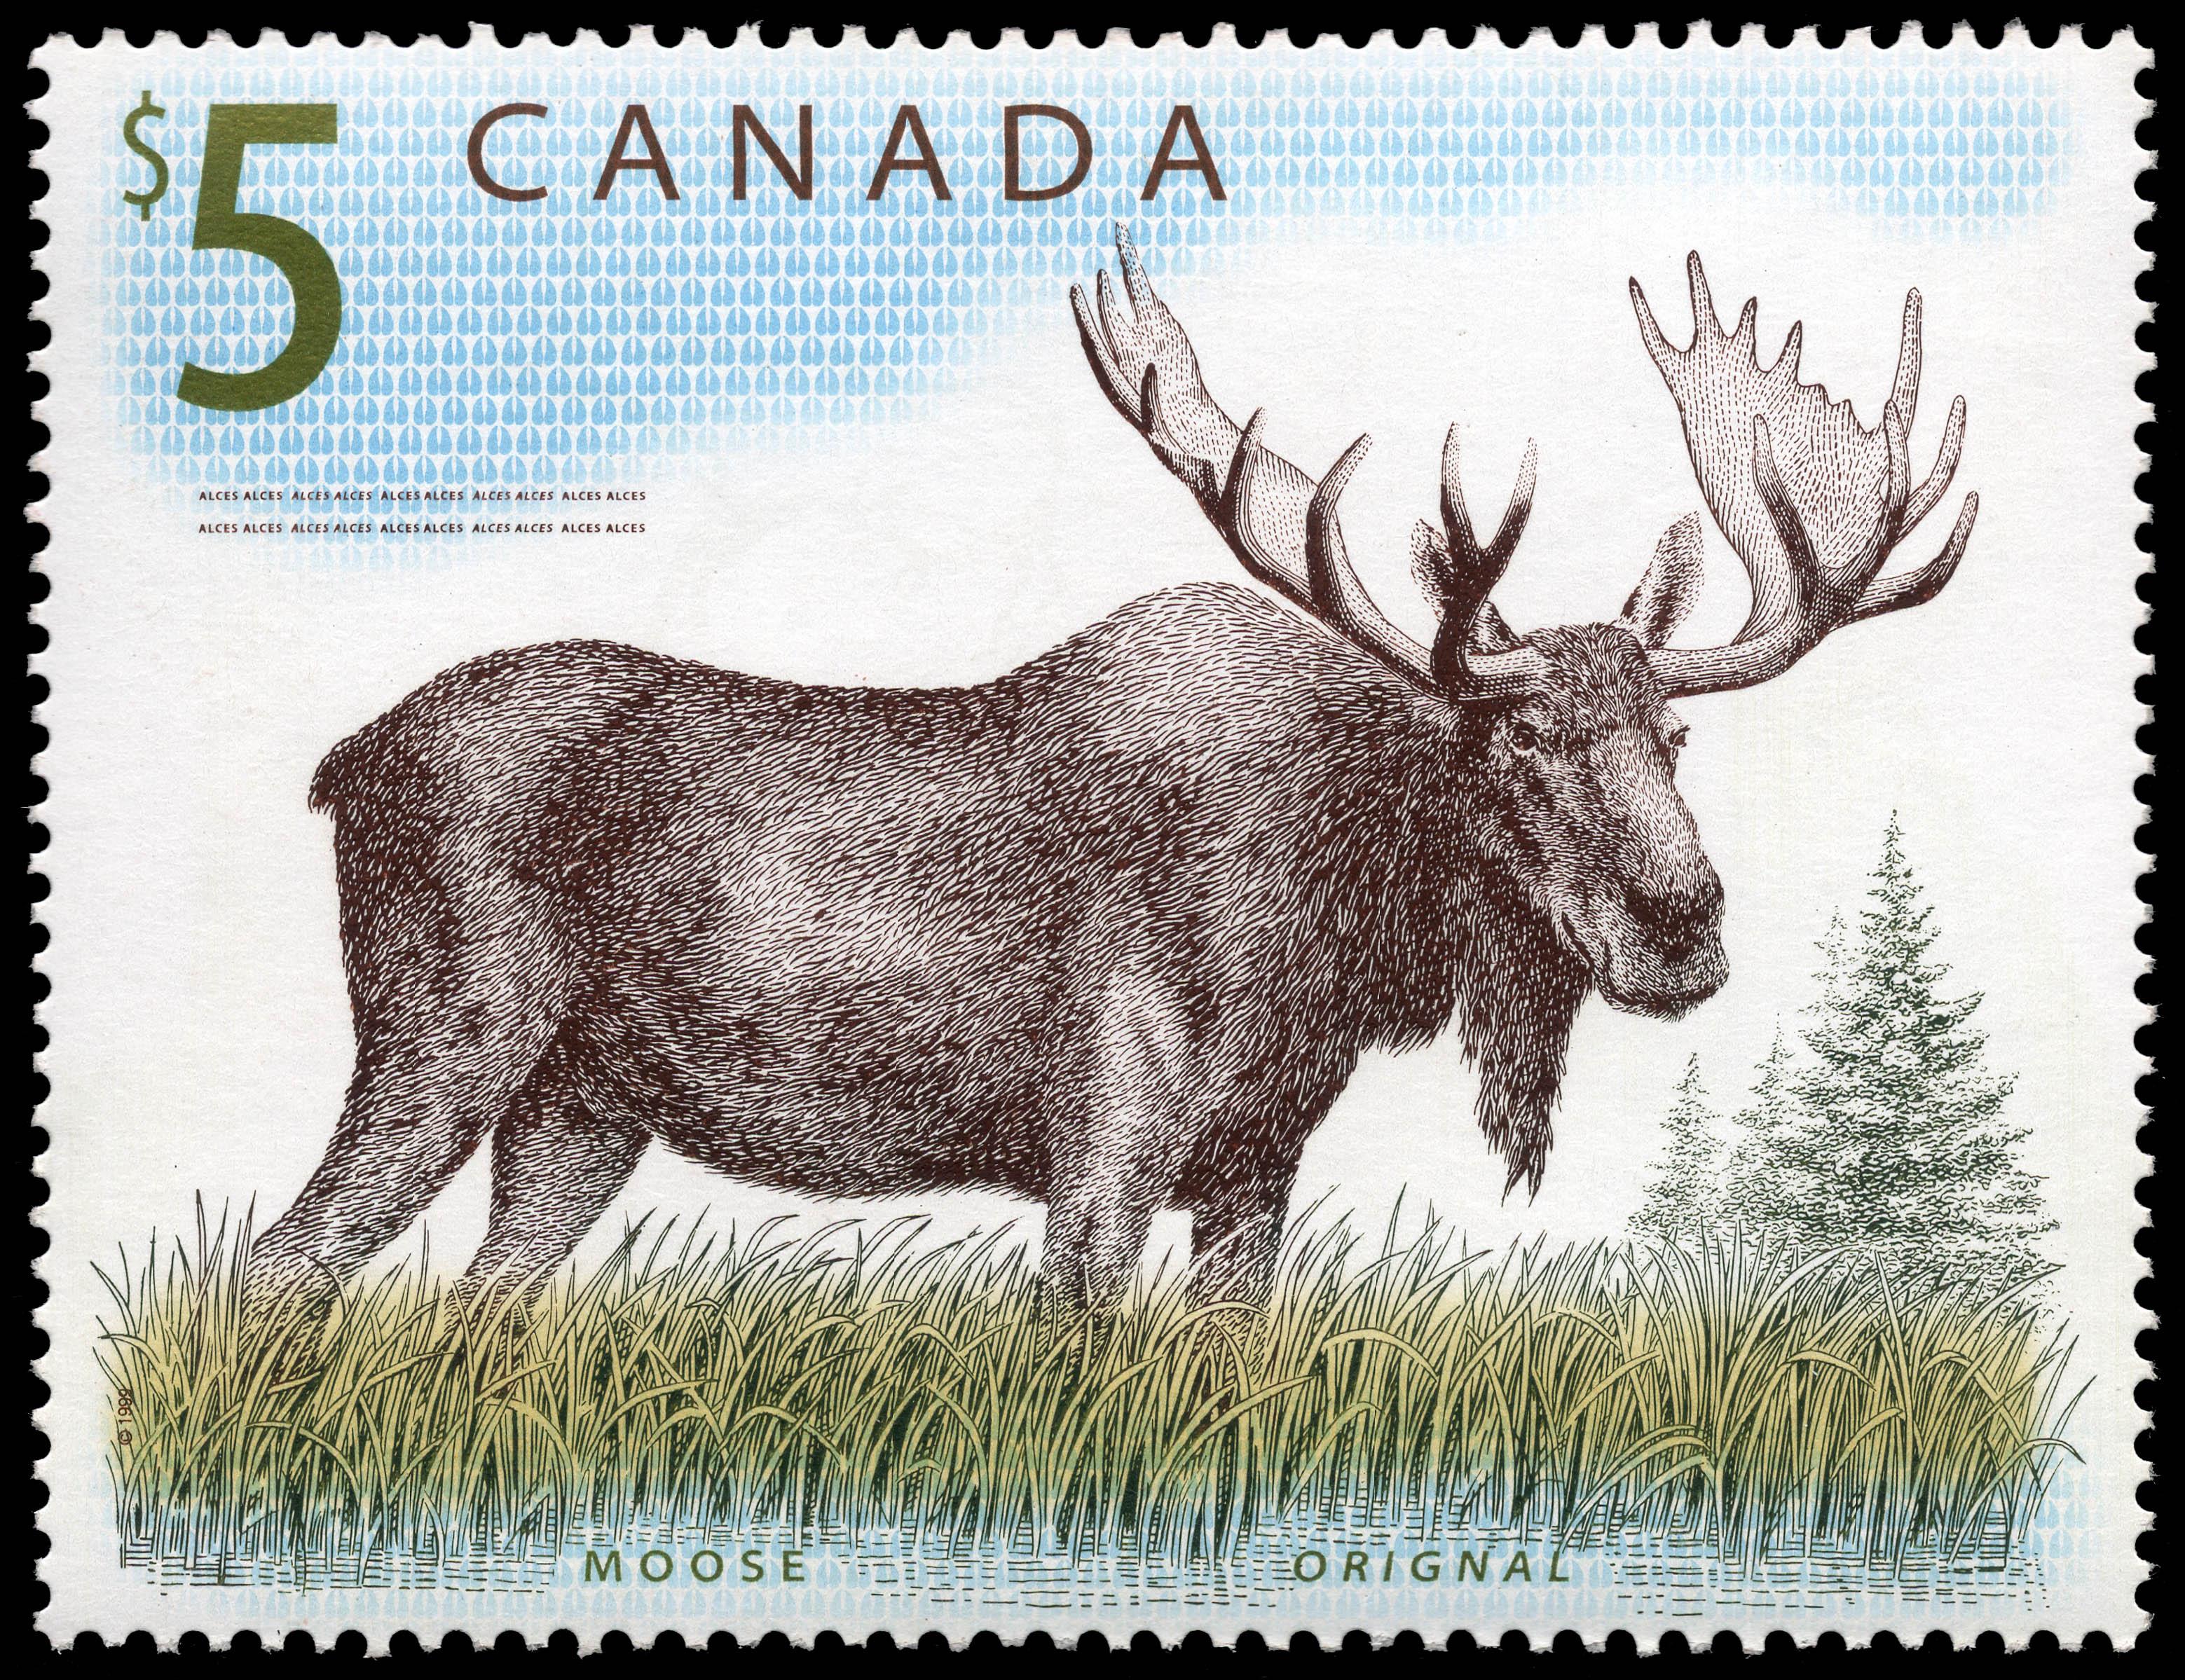 Moose Canada Postage Stamp | Canadian Wildlife